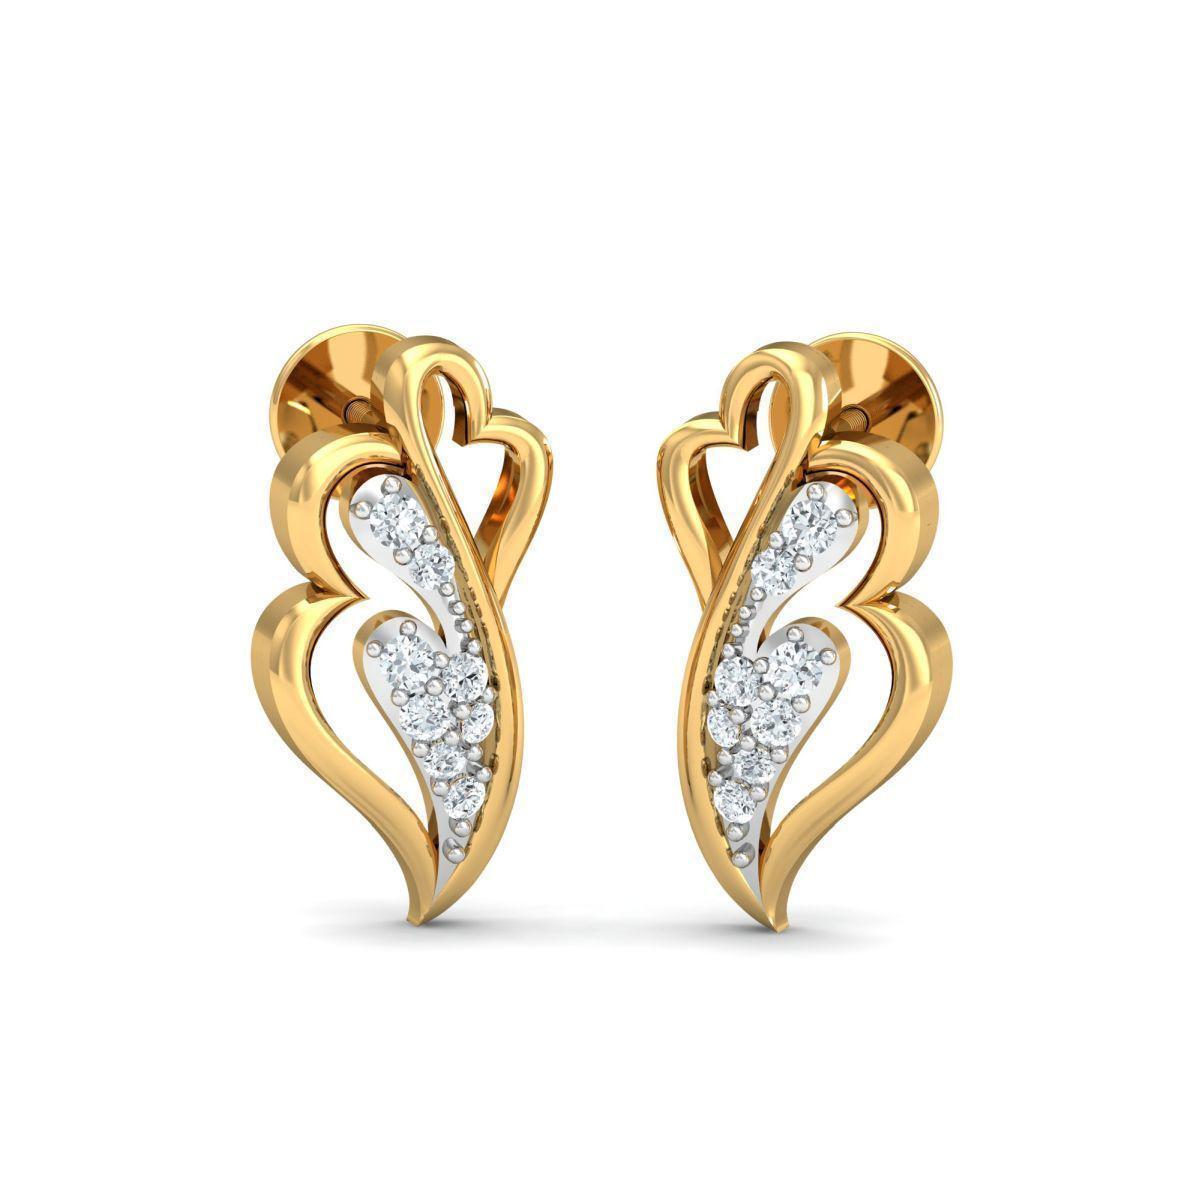 Diamoire Jewels 18kt Yellow Gold 0.13ct Pave Diamond Infinity Earrings III 0Hd4X38ja